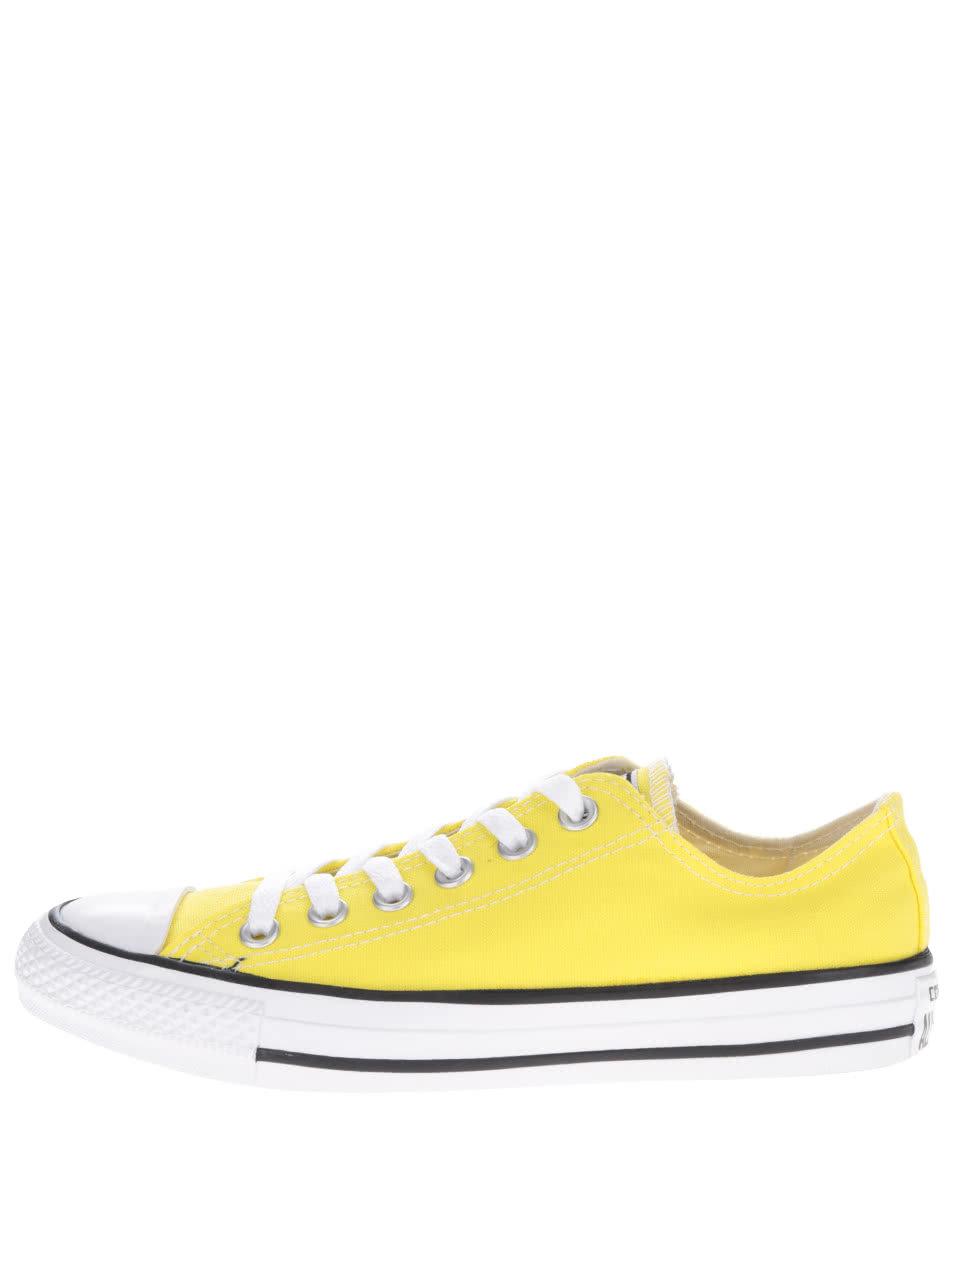 Žlté unisex tenisky Converse Chuck Taylor All Star ... 2df86497b3d